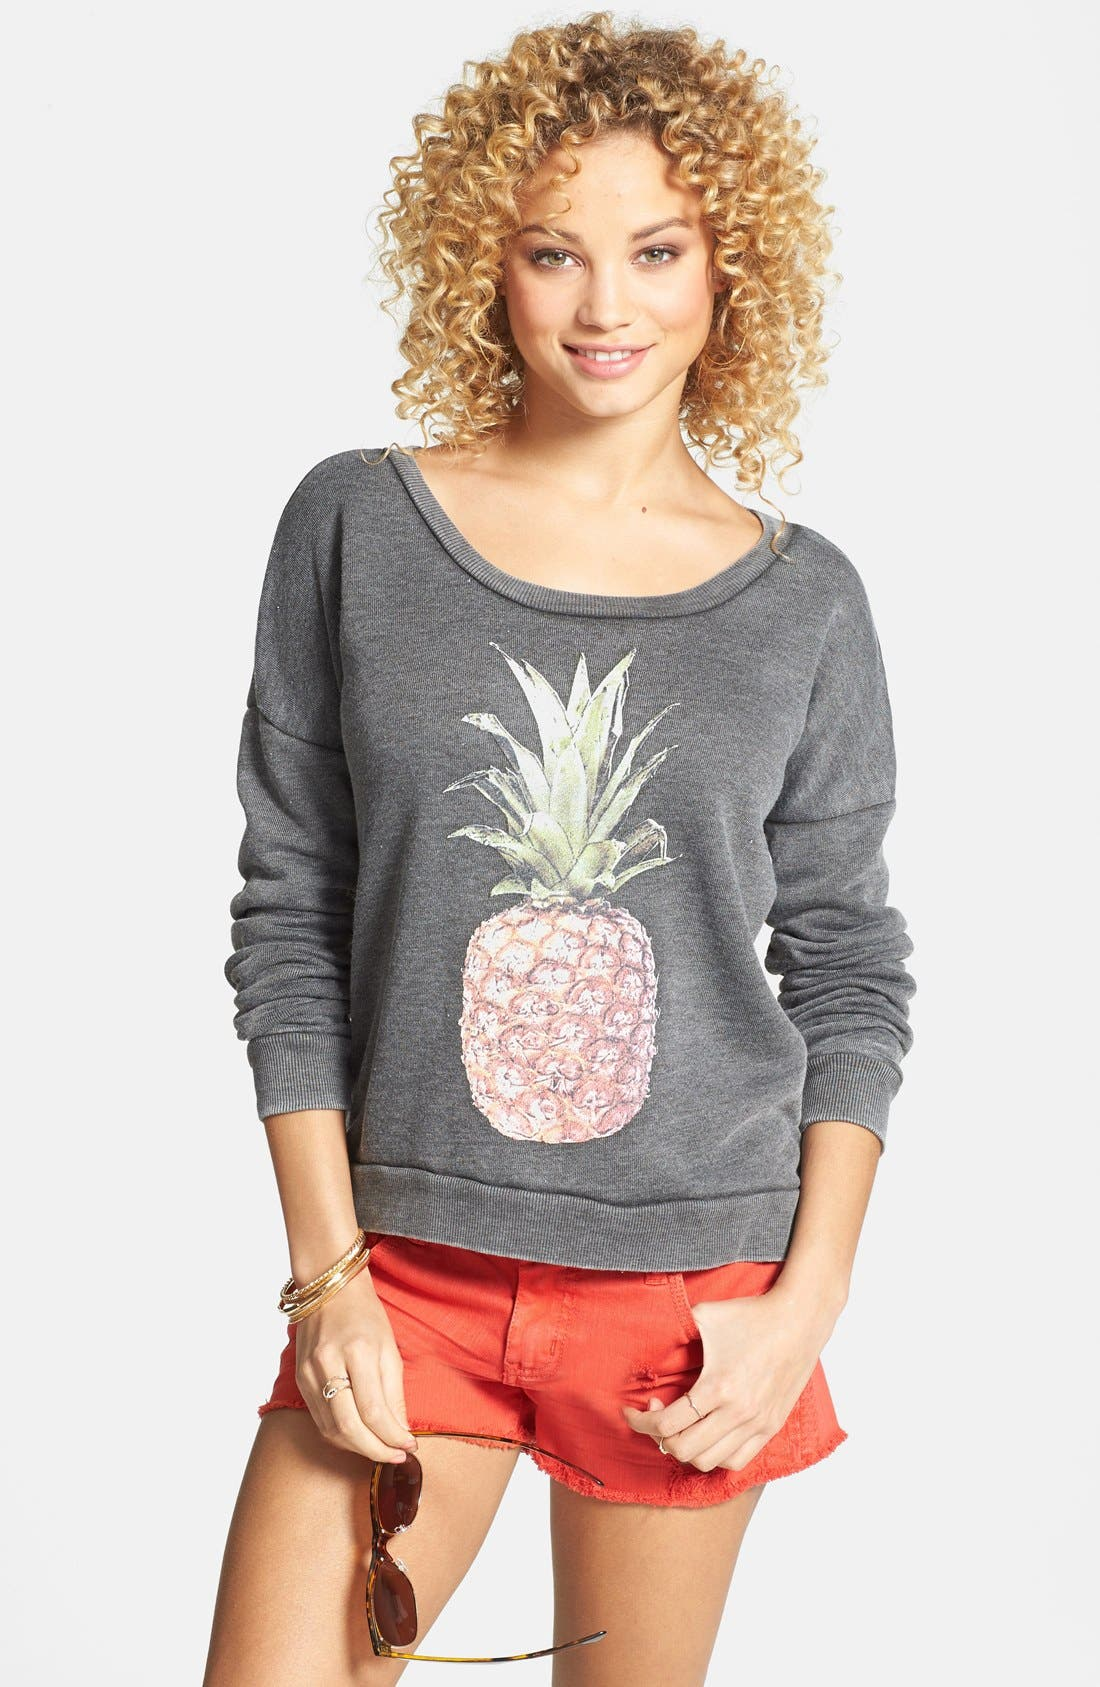 Alternate Image 1 Selected - Billabong 'She Sells' Pineapple Print Pullover (Juniors) (Online Only)